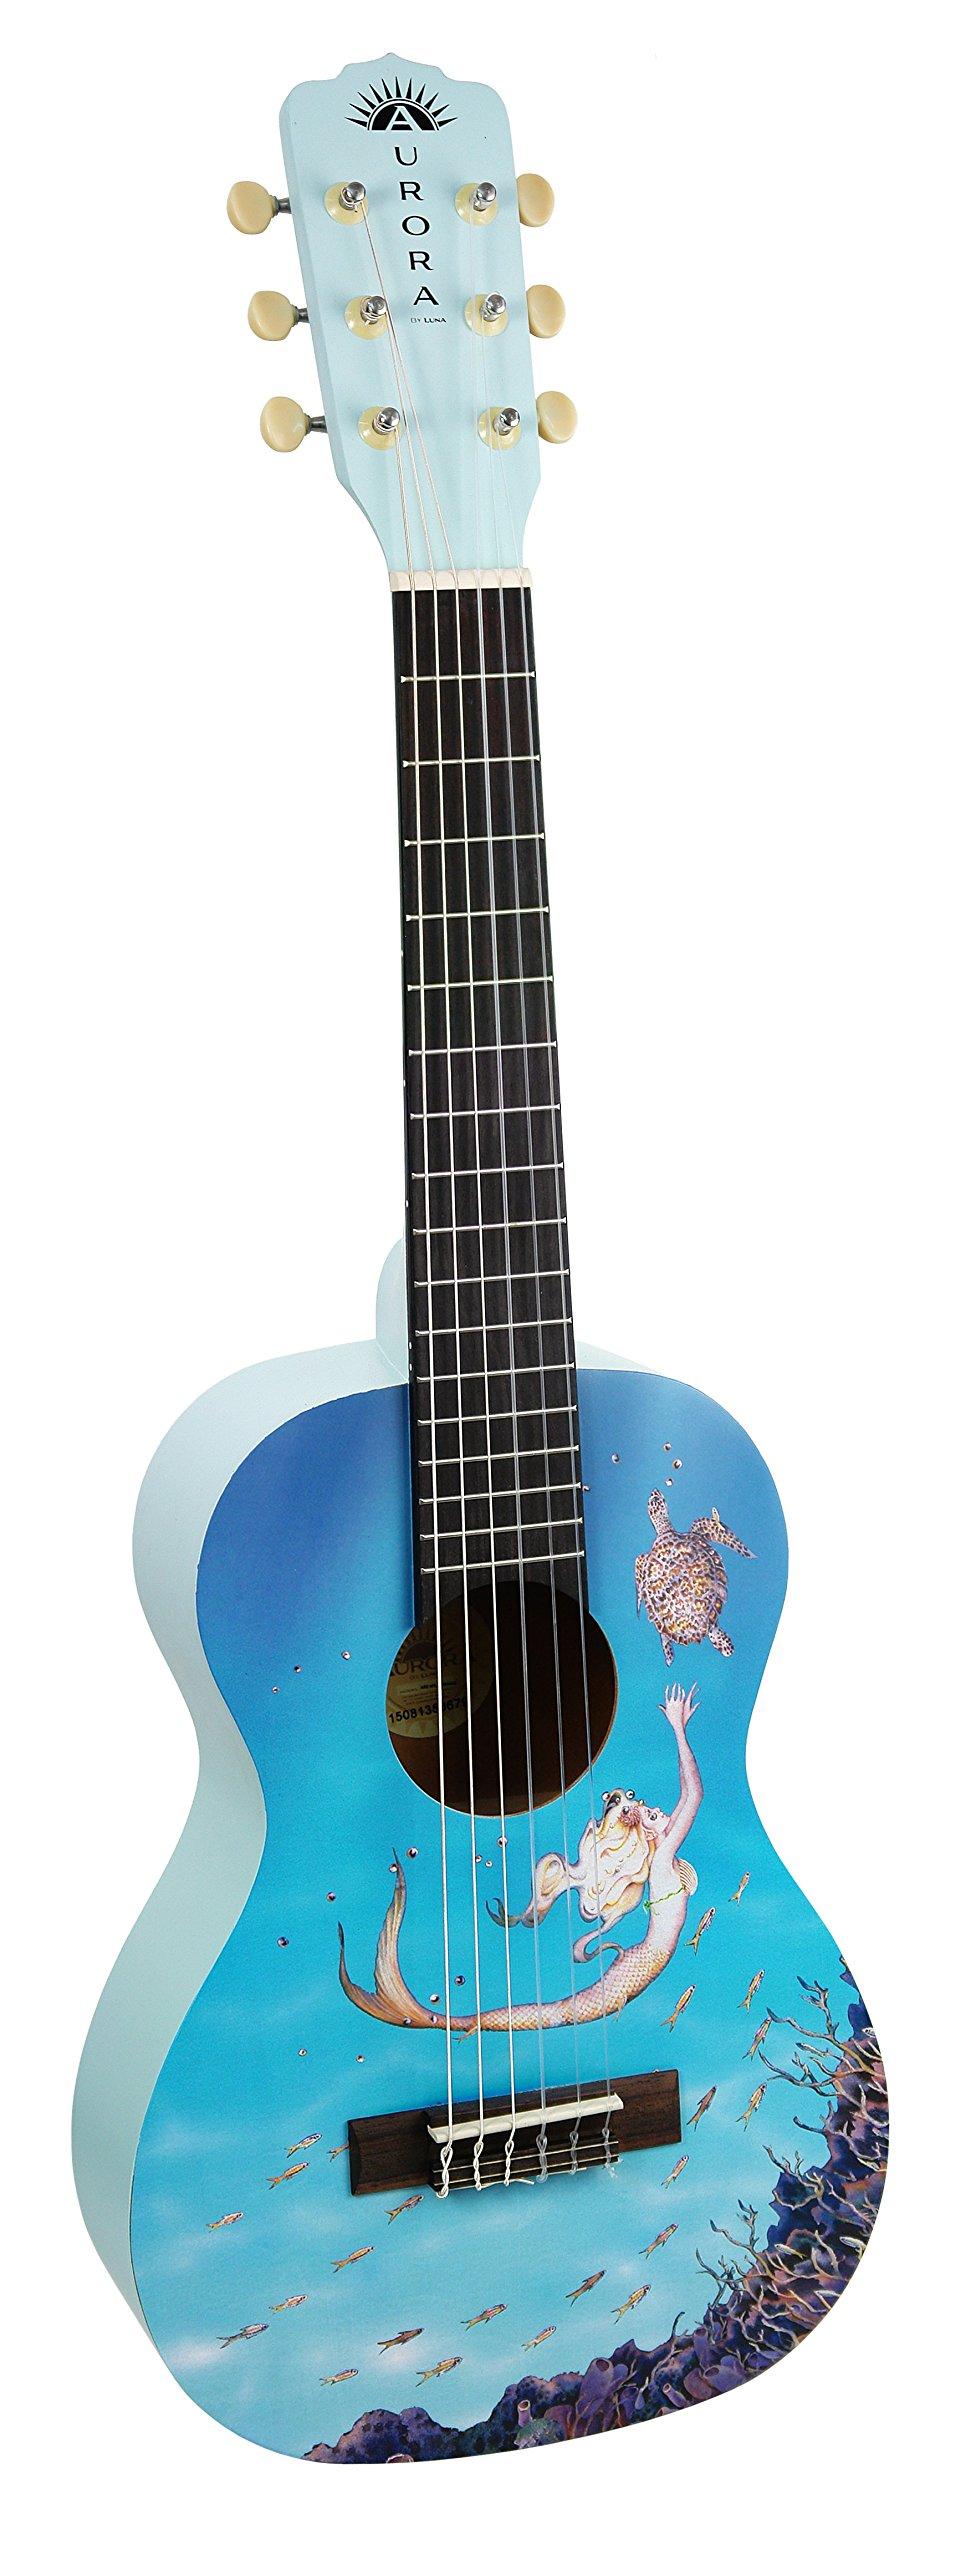 Luna AR2 NYL MERMAID Aurora 1/2 Acoustic Guitar, Nylon Mermaid by Luna Guitars